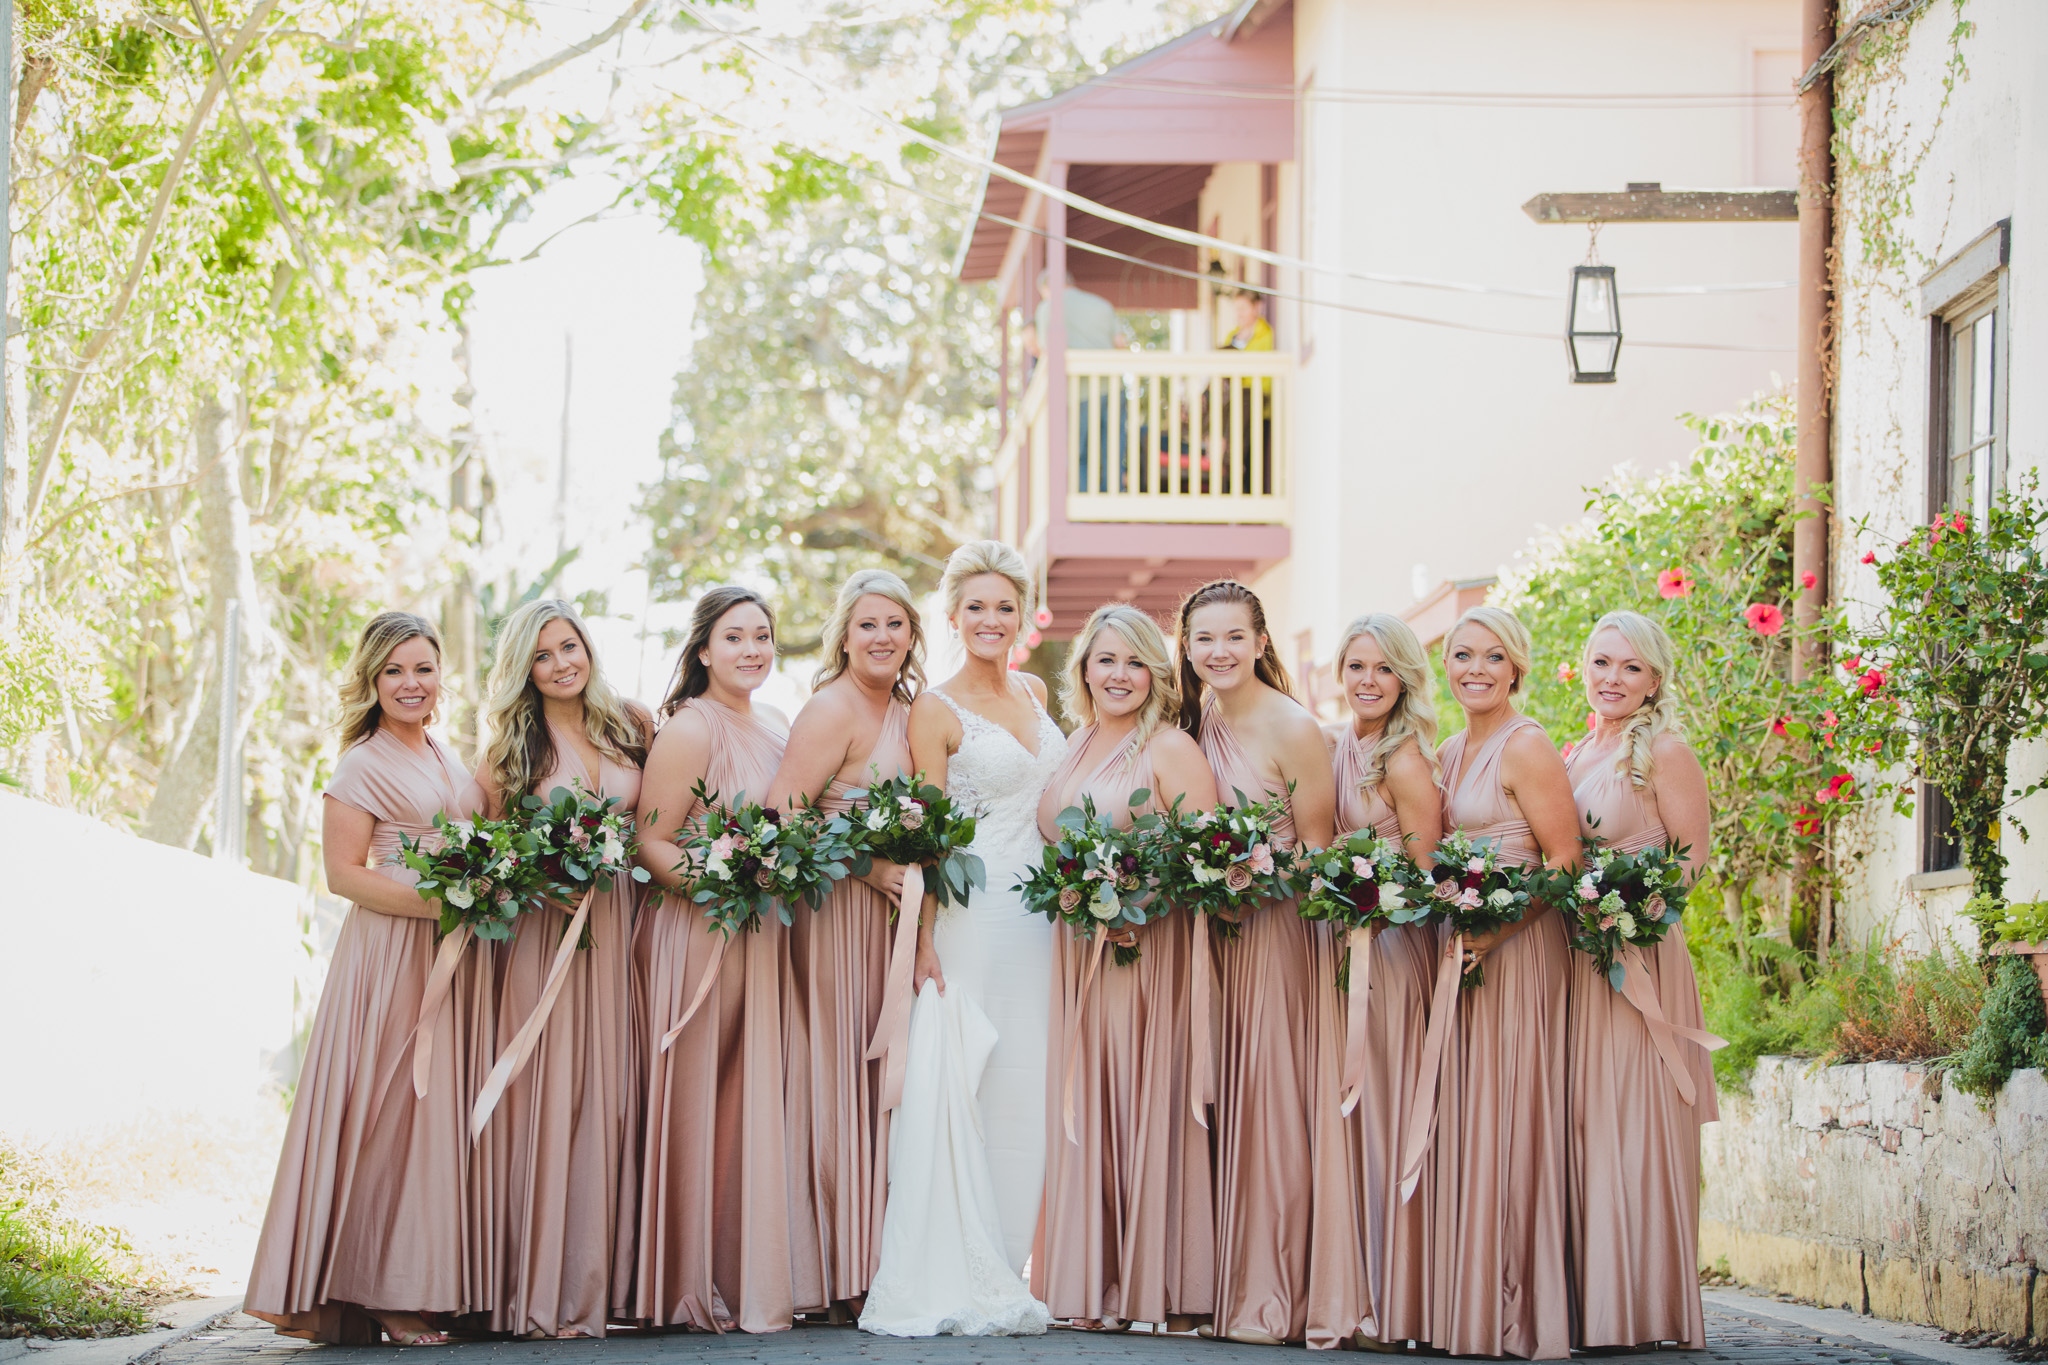 st-augustine-florida-weddings-white-room-bridesmaids